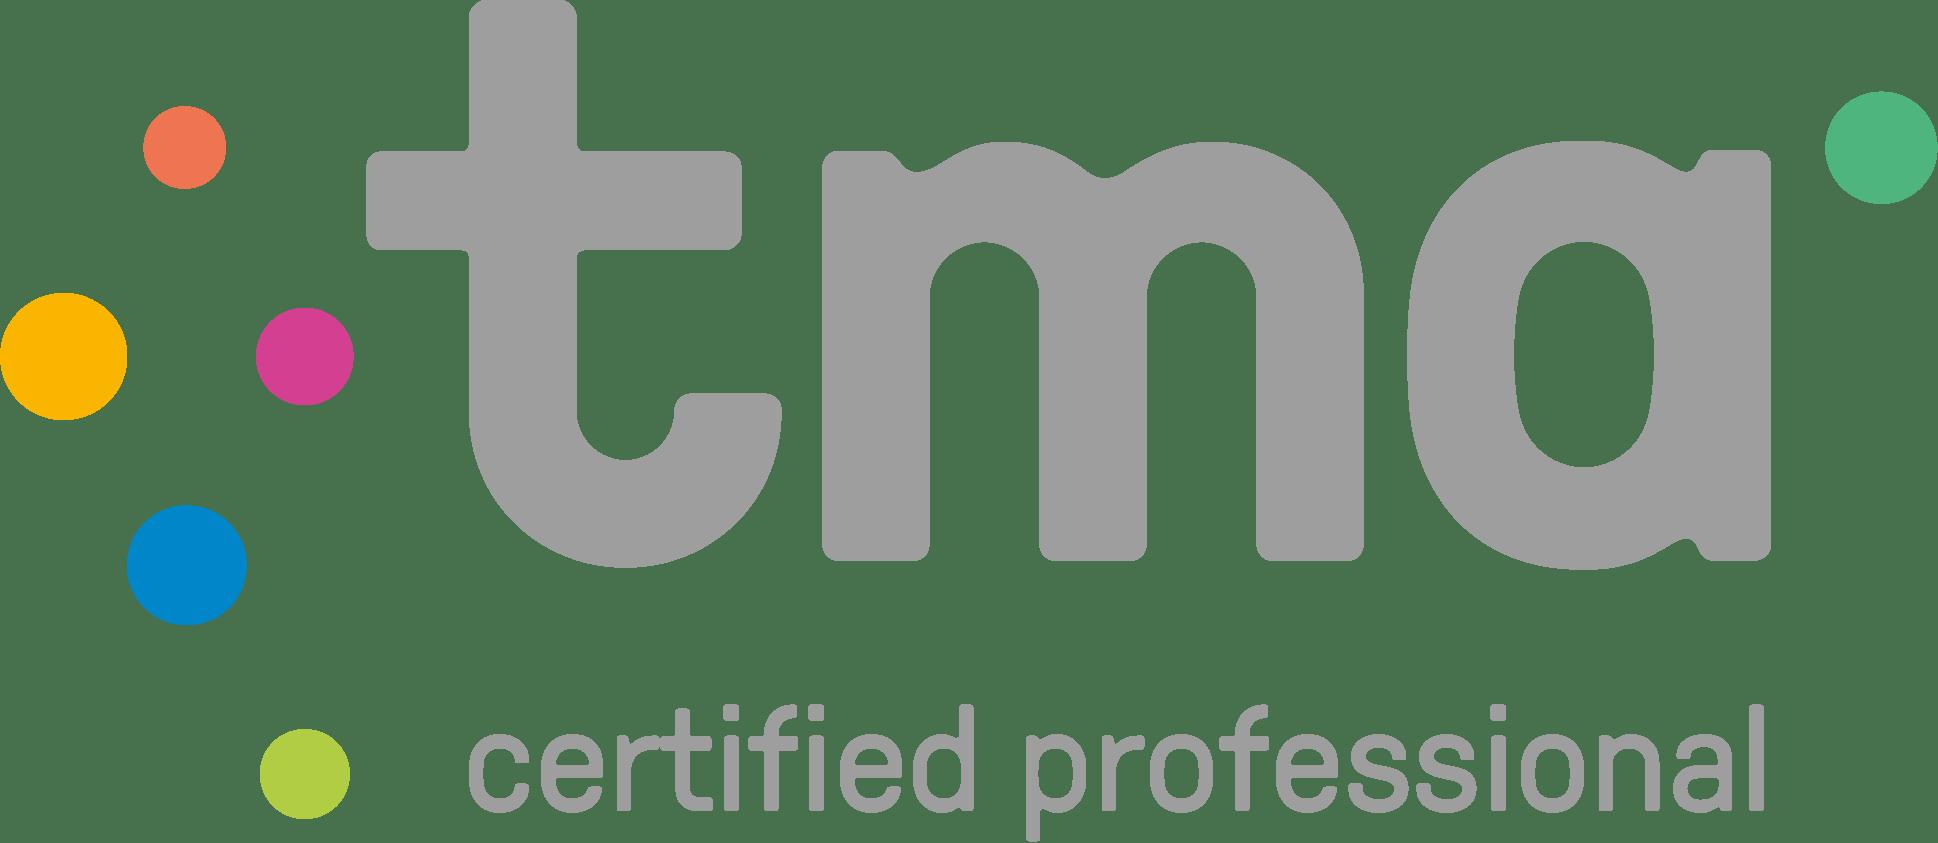 TMA-Certifiedprofessional-logo